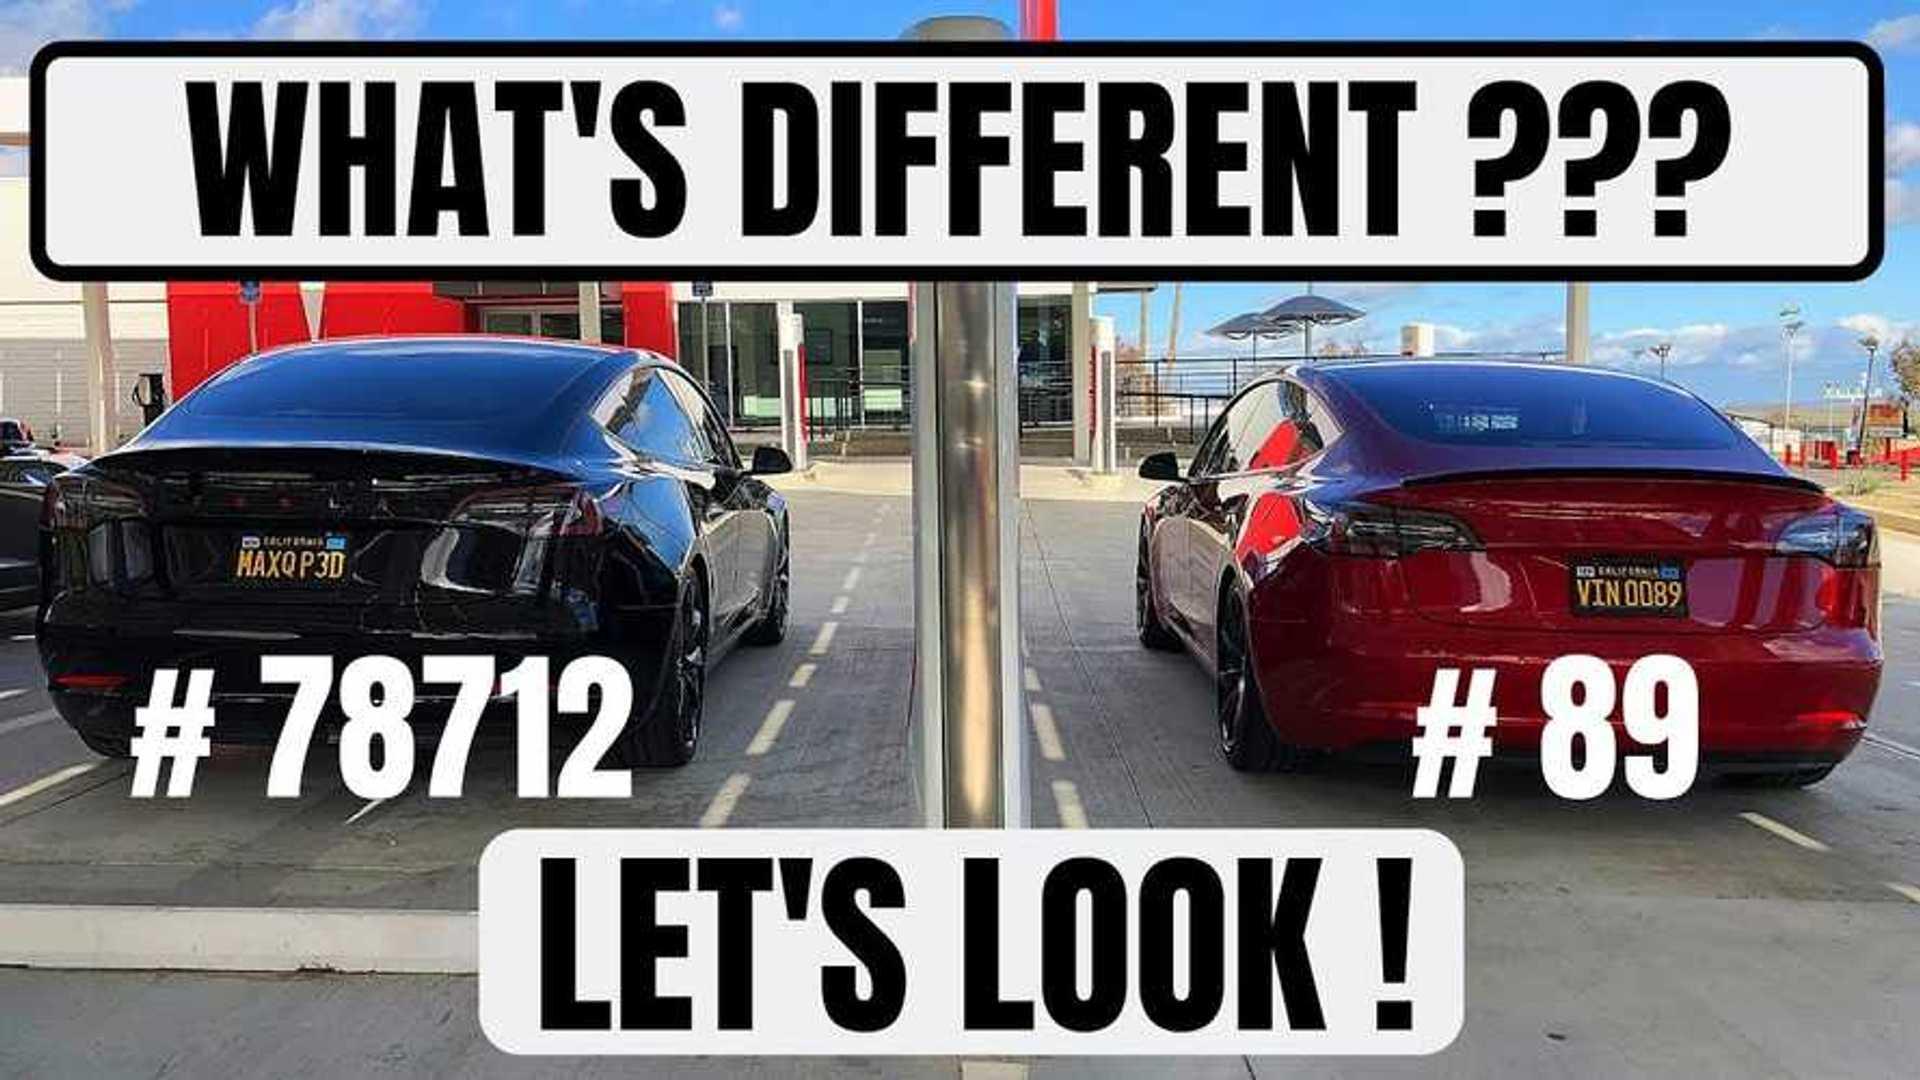 Tesla Model 3 VIN #89 Vs VIN #78712: What's Changed? Video